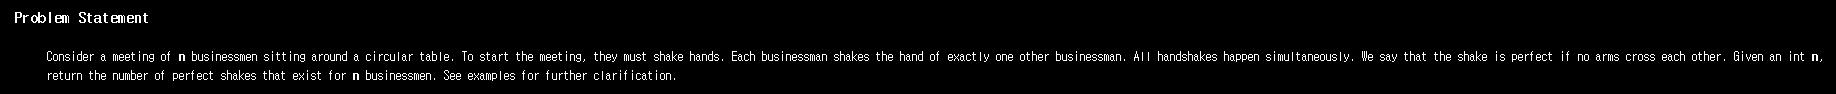 [TopCoder] 악수(HandShaking) 분석 및..